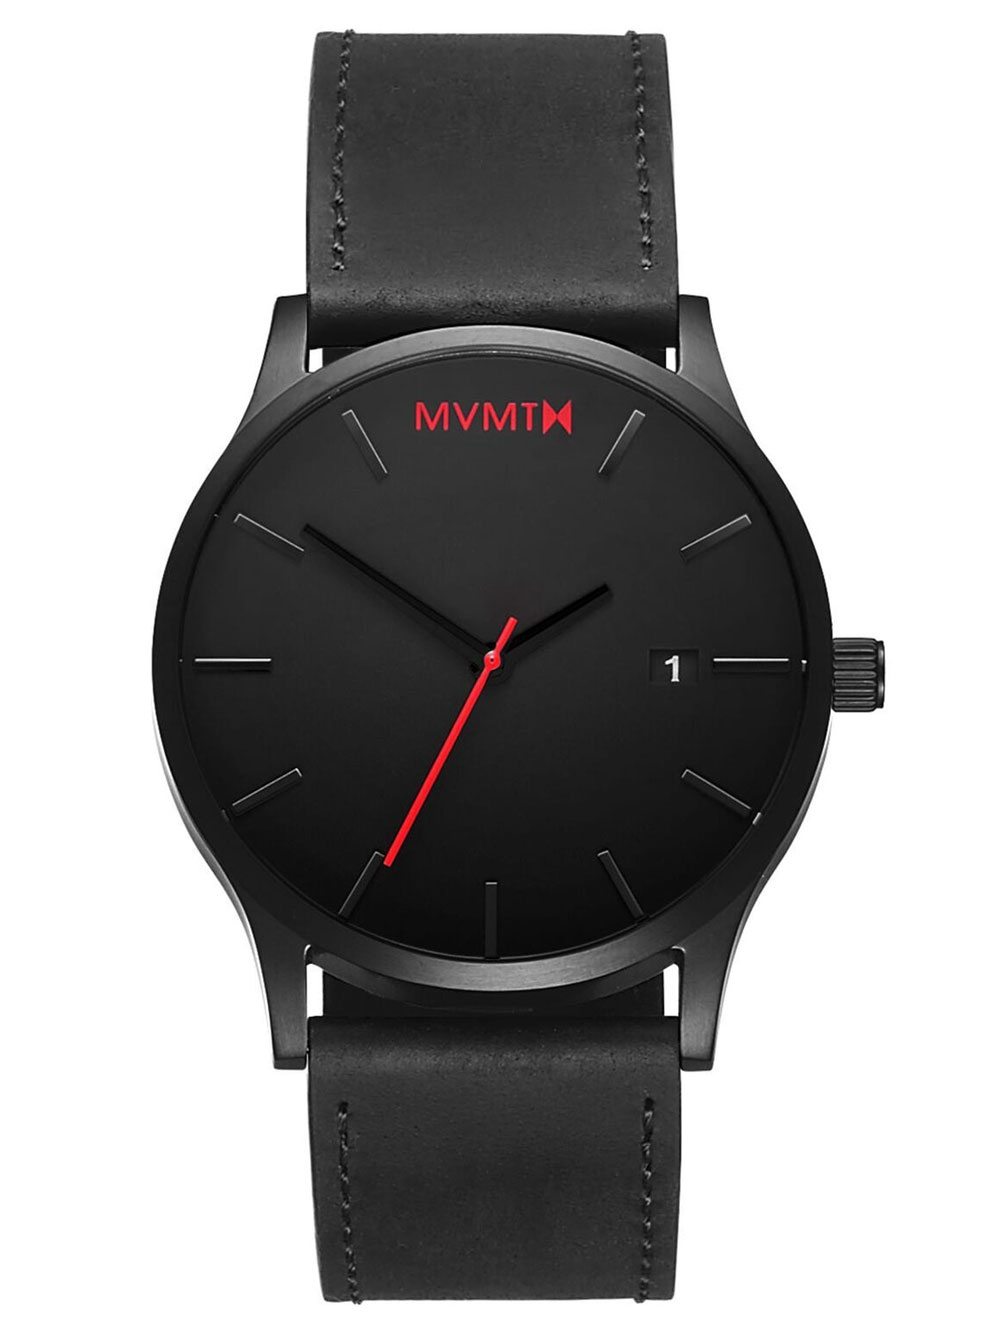 MVMT L213.5L.551 Classic Black Leather 45mm 3ATM